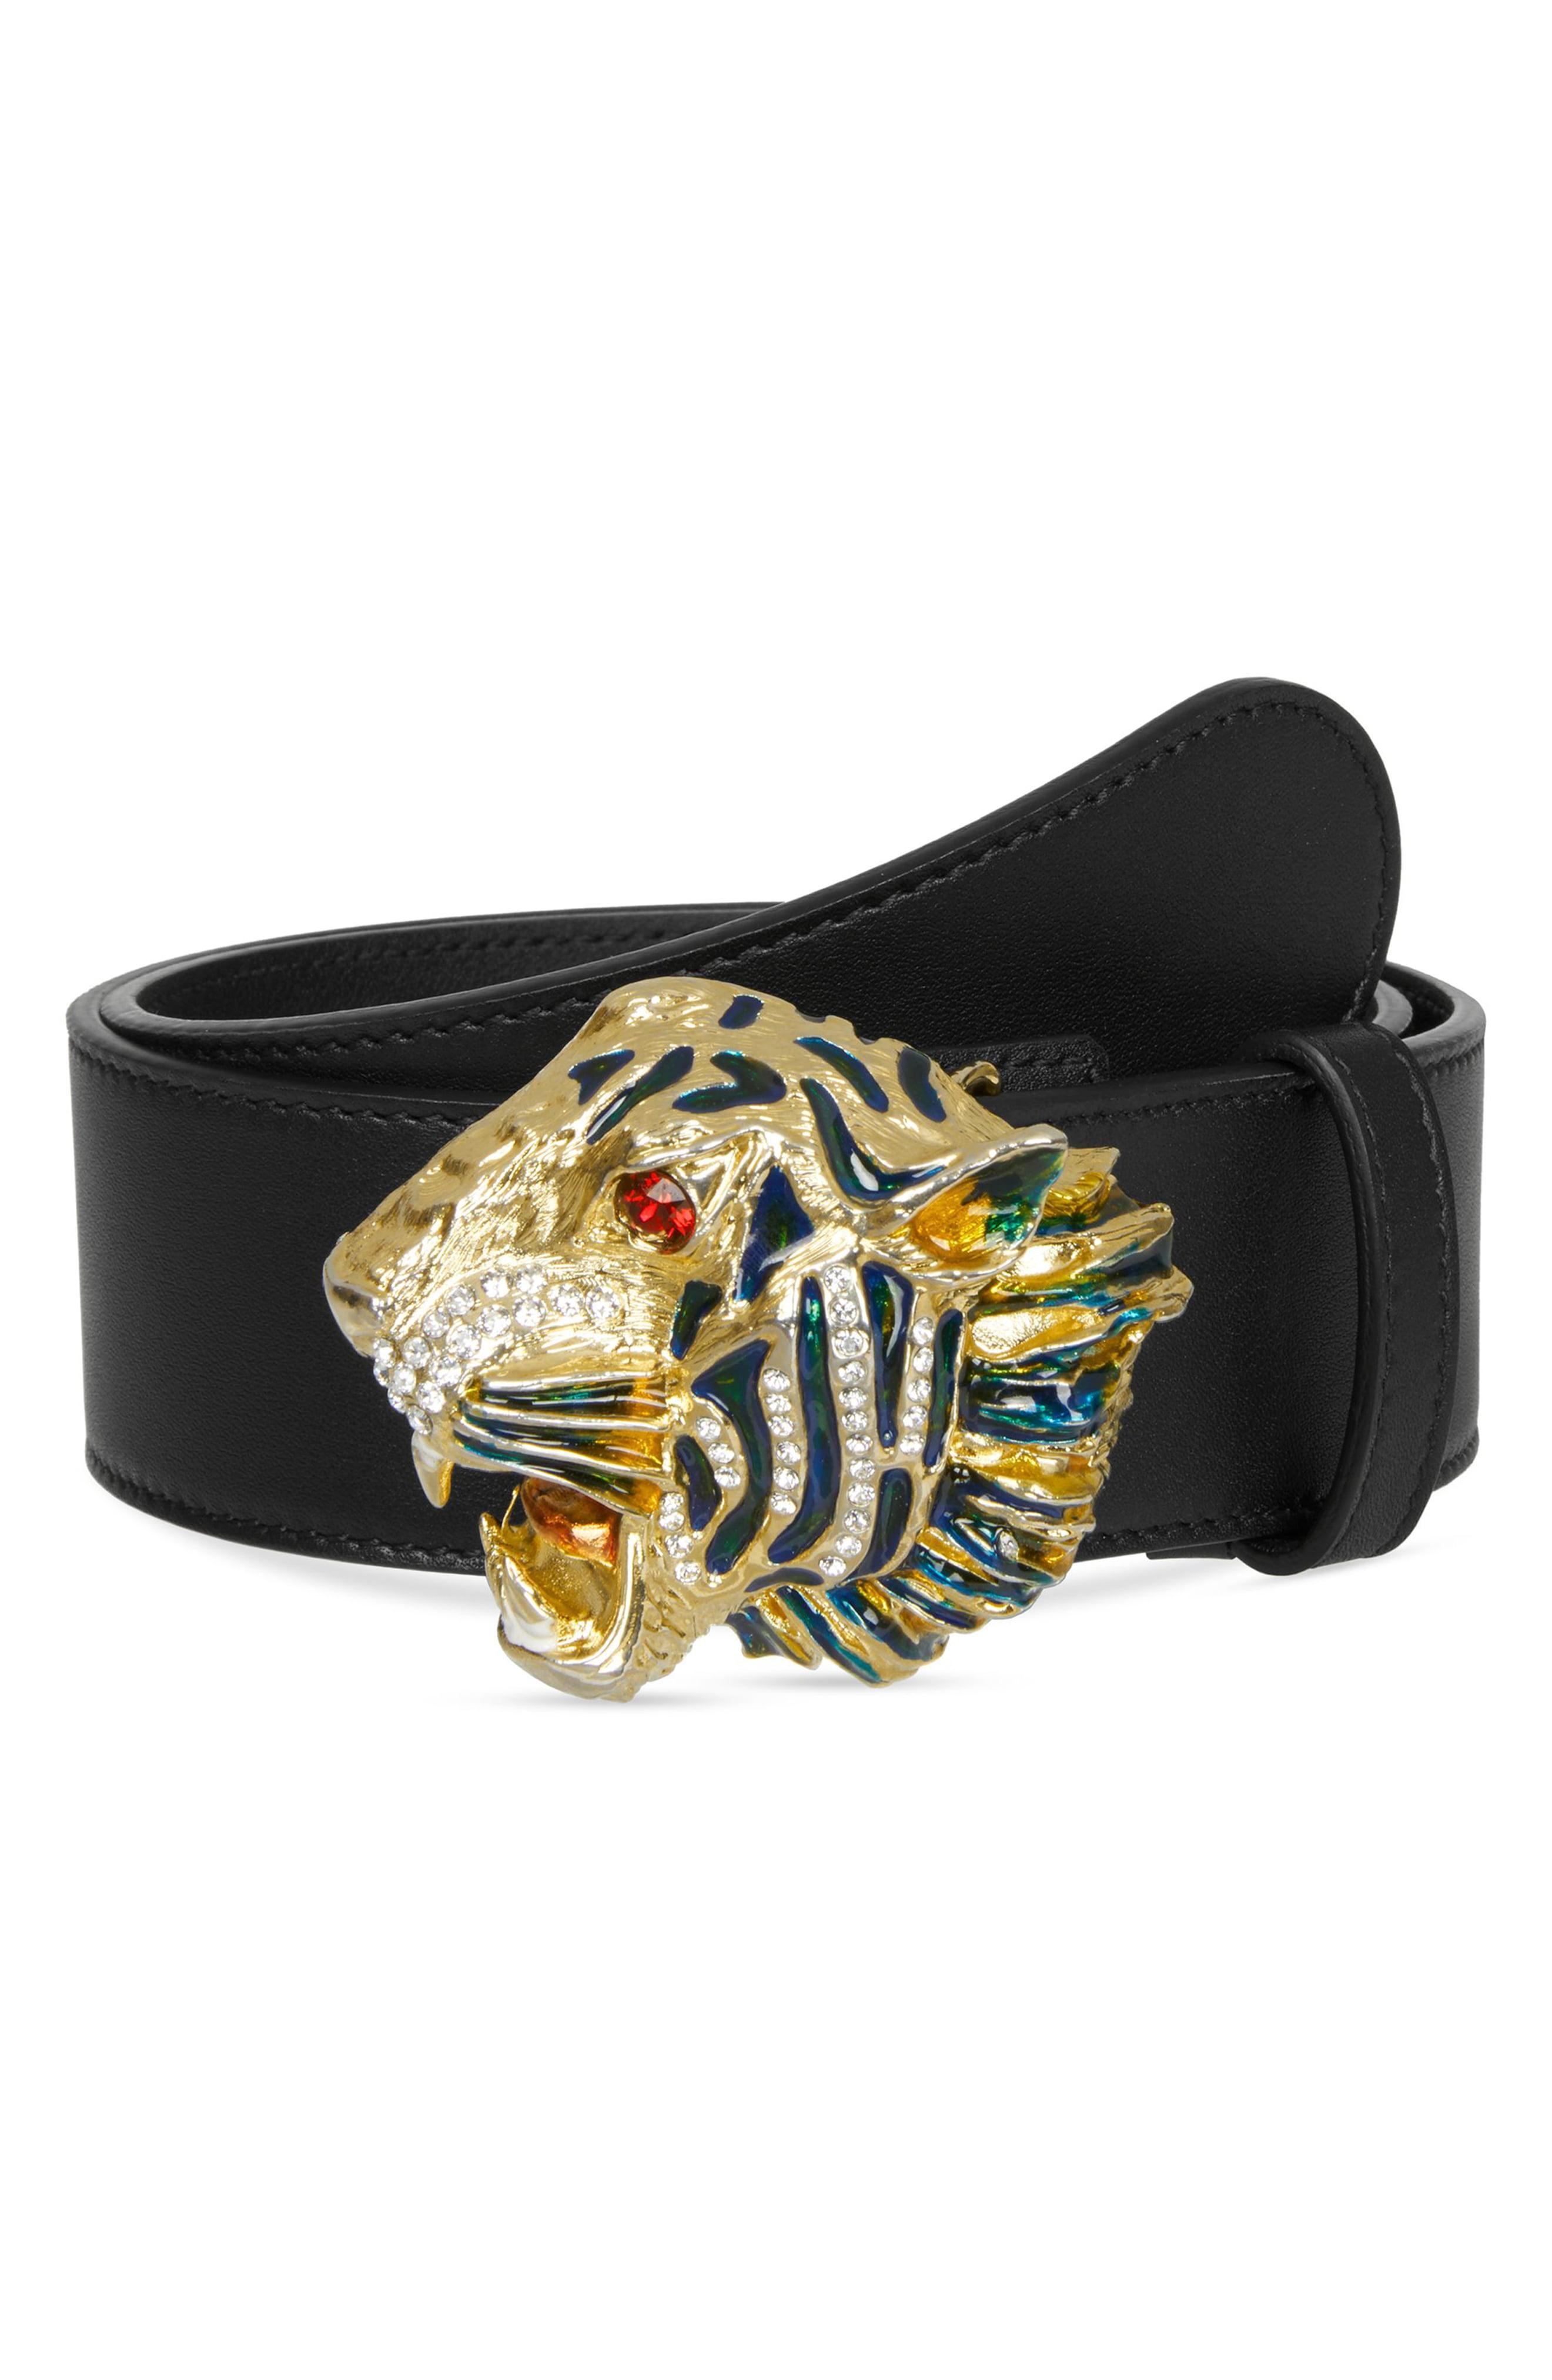 9c662050639 Lyst - Gucci Crystal Tiger Head Leather Belt in Black